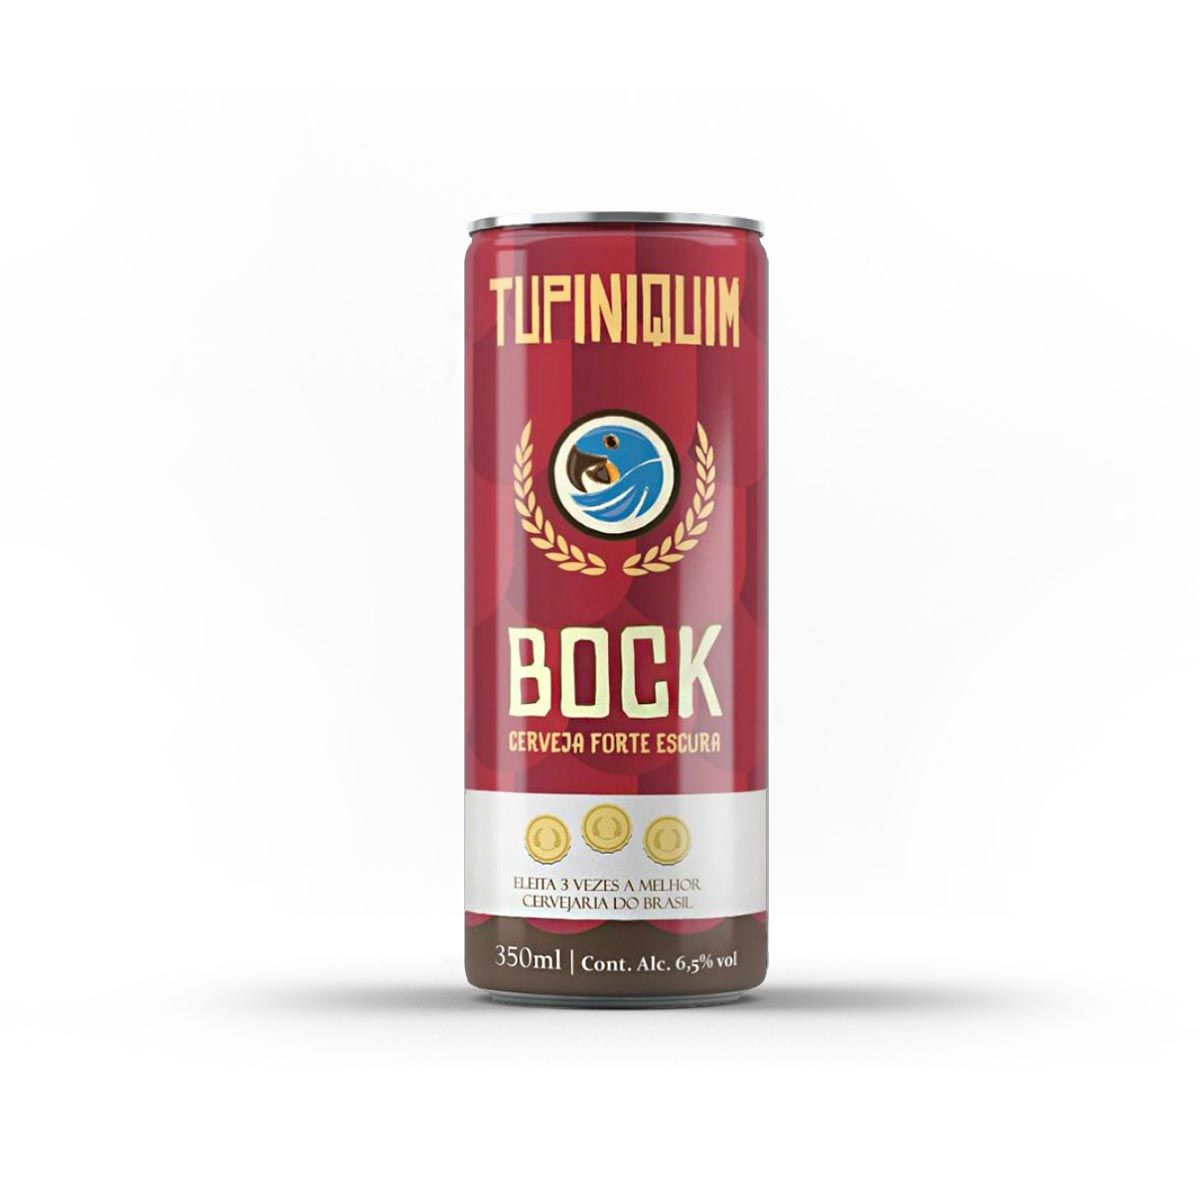 Tupiniquim Bock 350ml